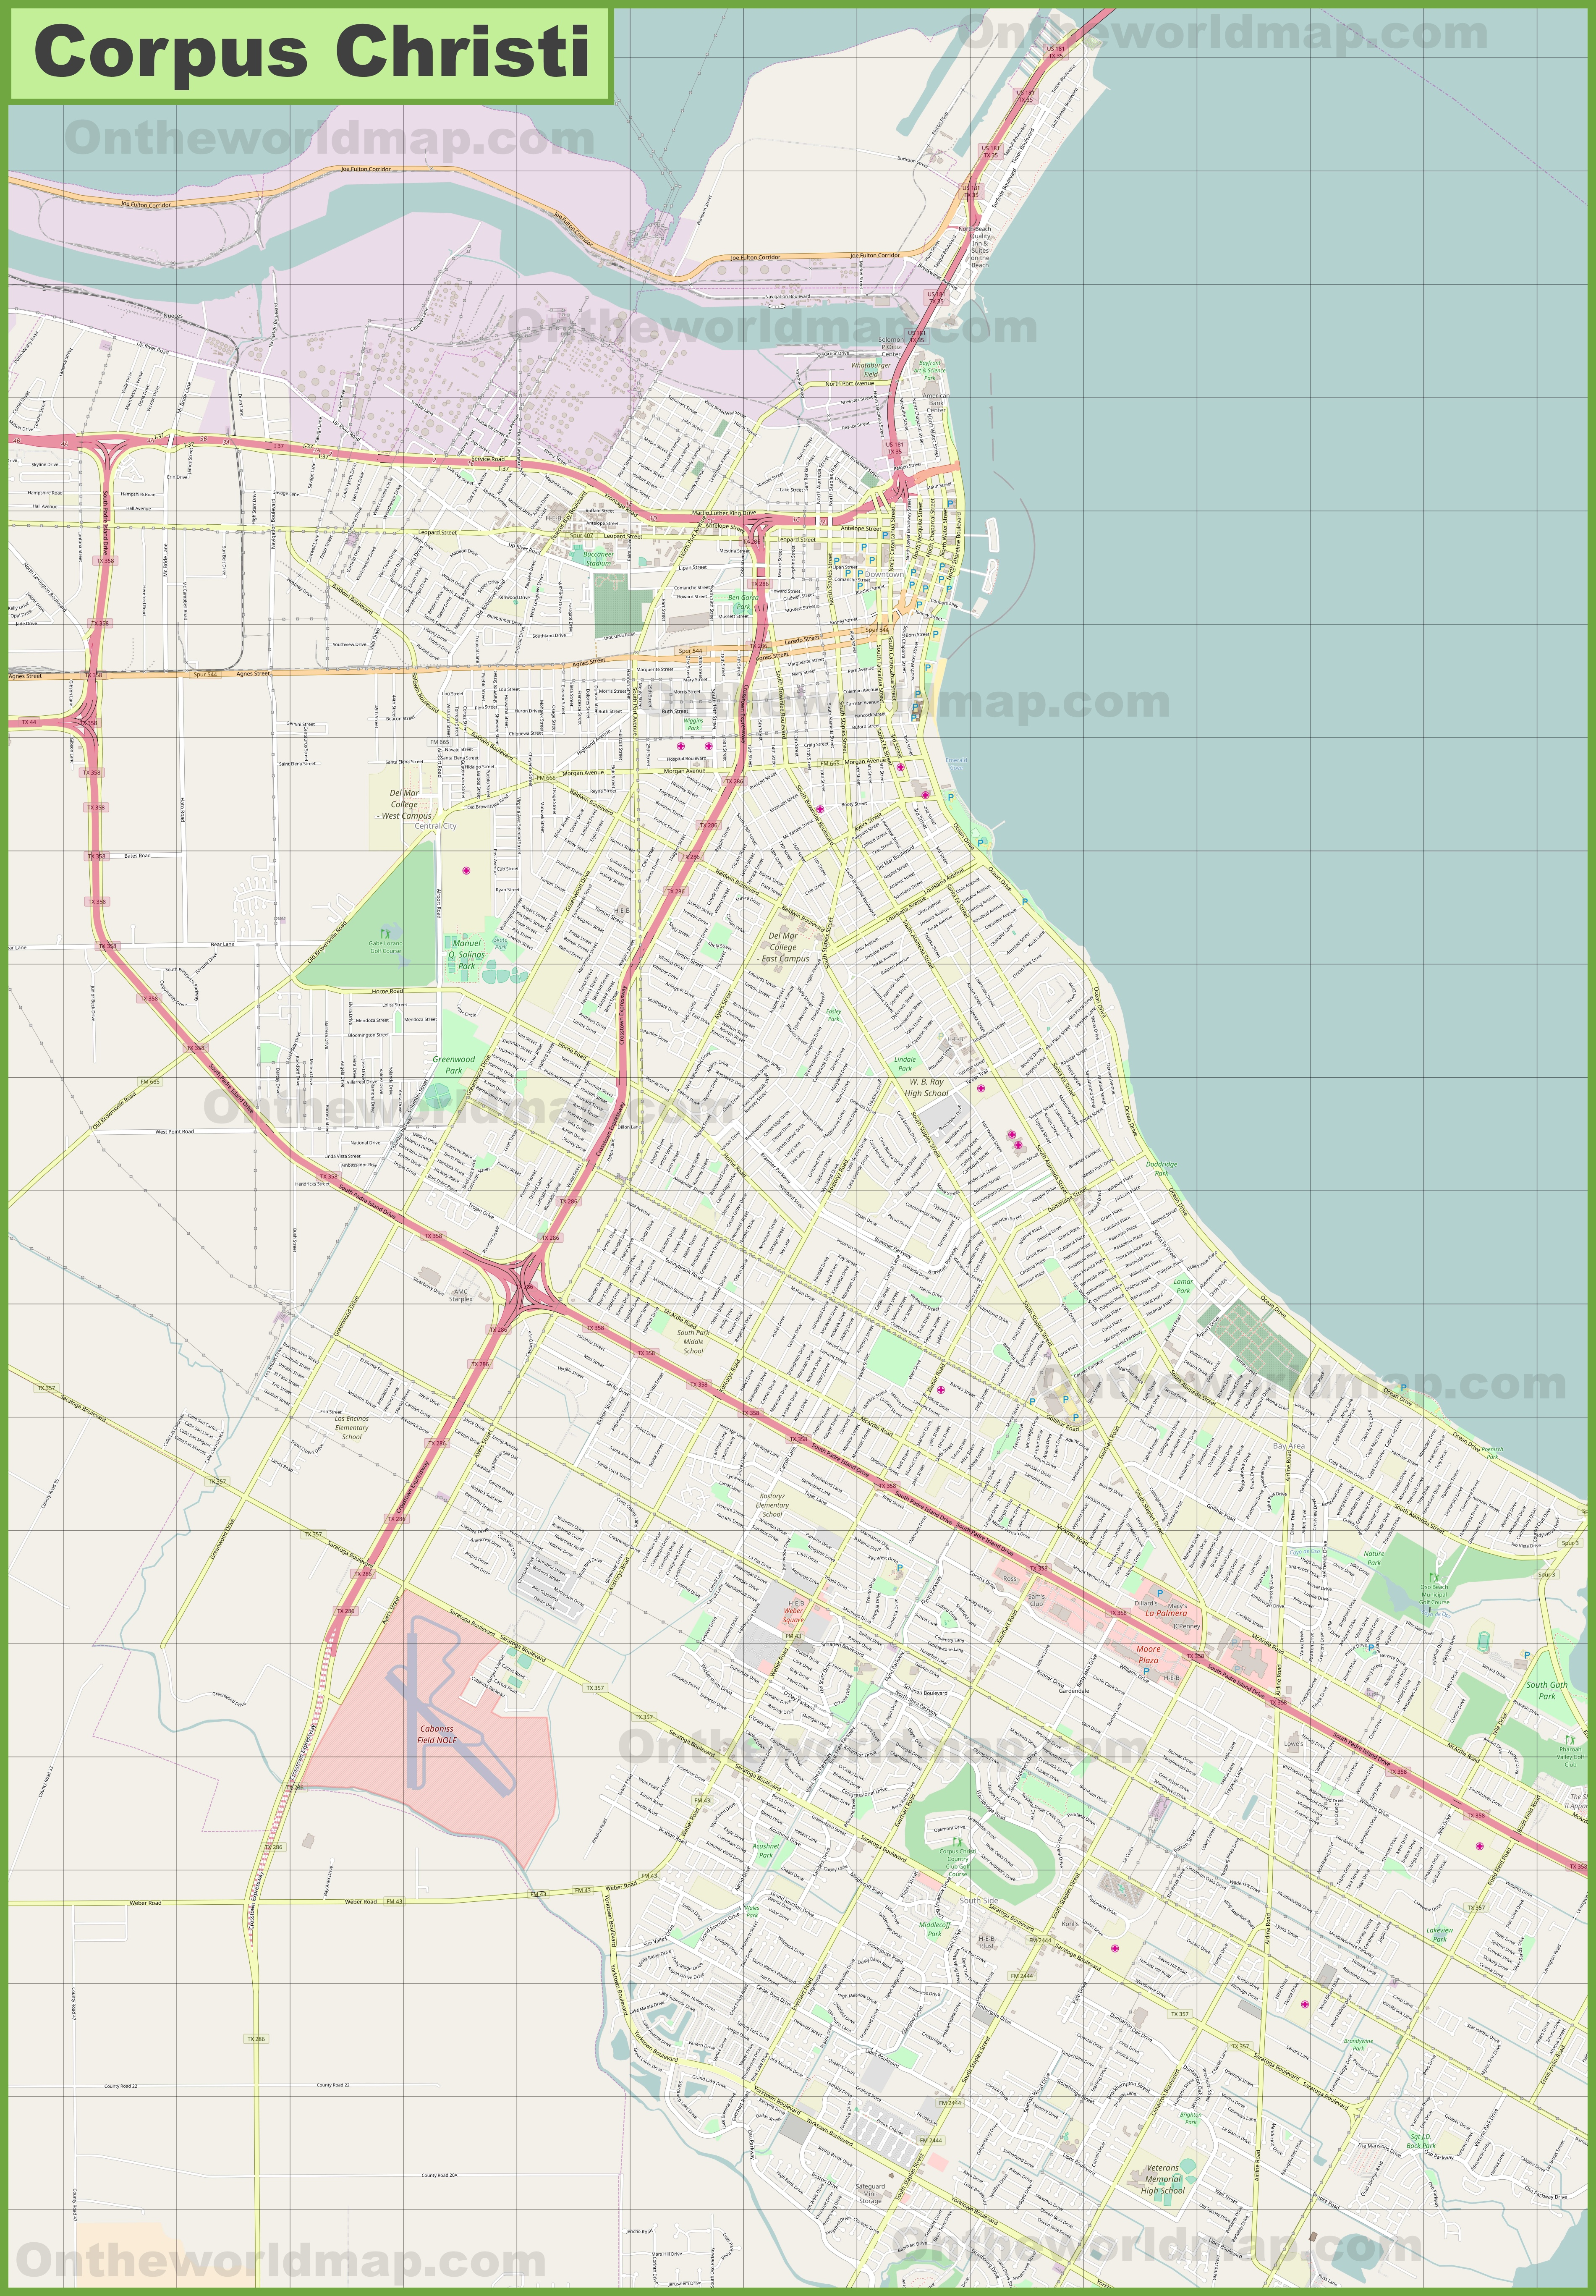 Street Map Of Corpus Christi Texas Large detailed map of Corpus Christi